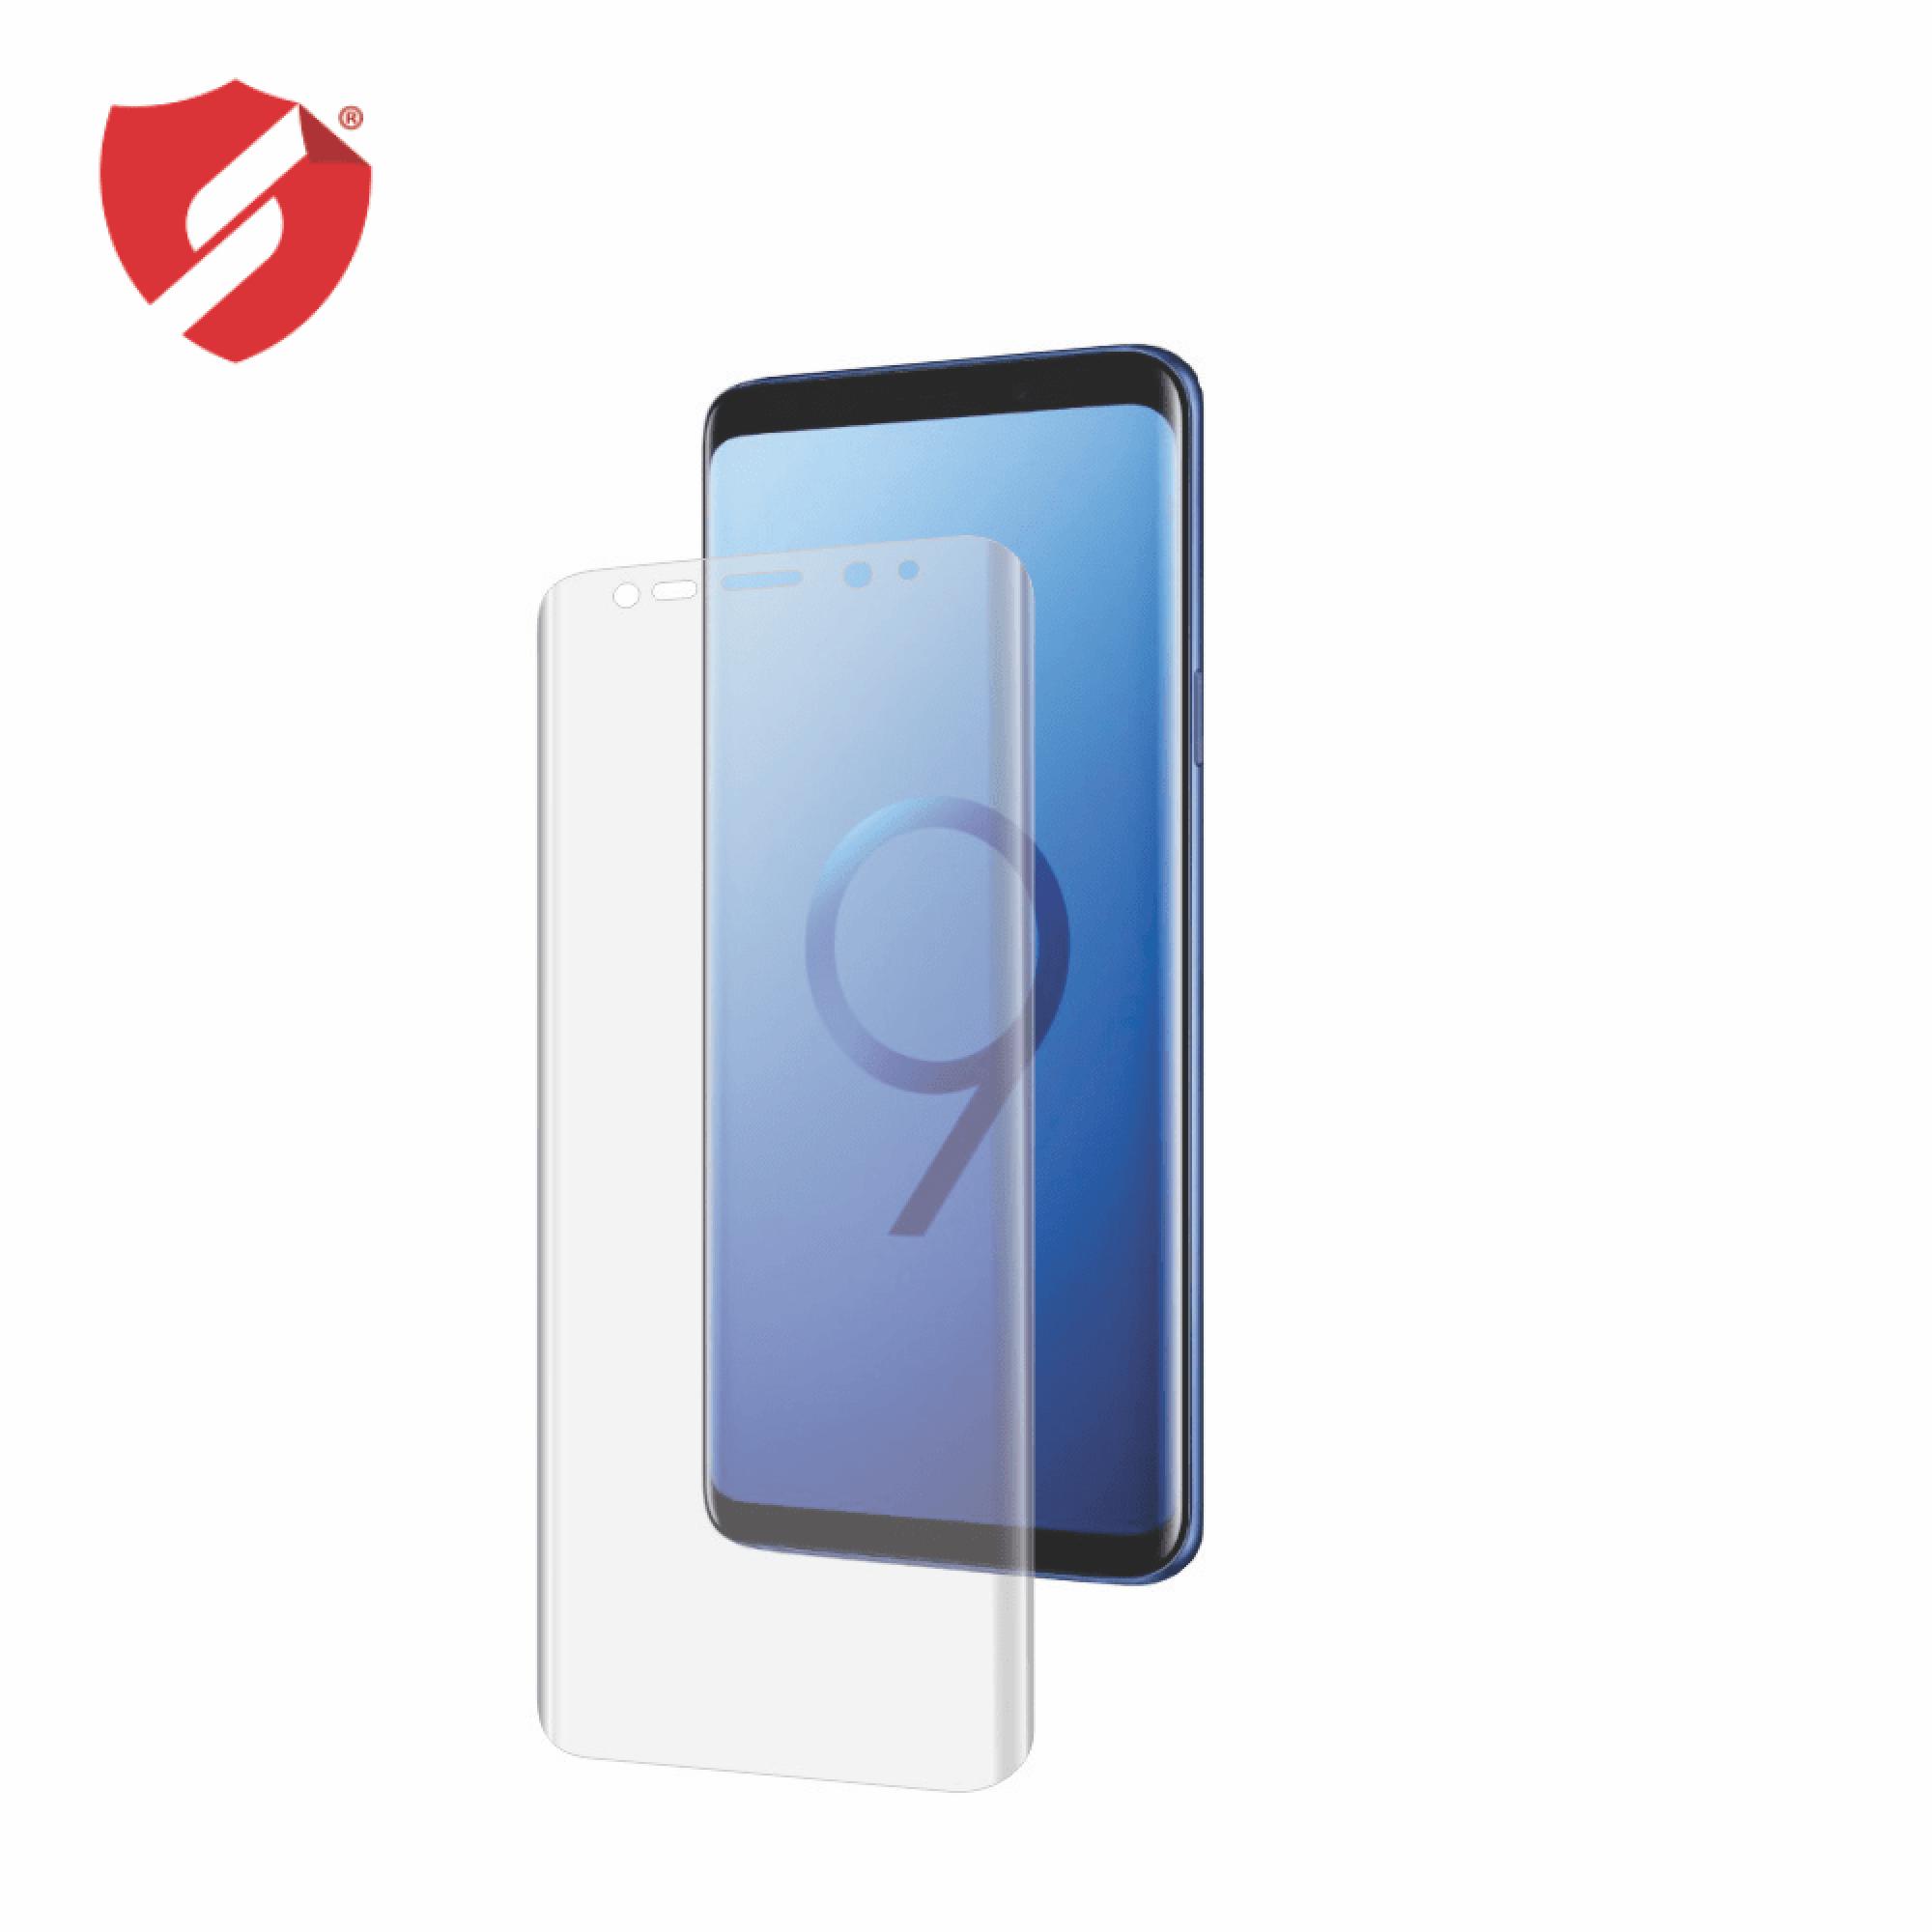 Folie de protectie Smart Protection Samsung Galaxy S9 compatibila cu carcasa Spigen Liquid Air - doar-display imagine